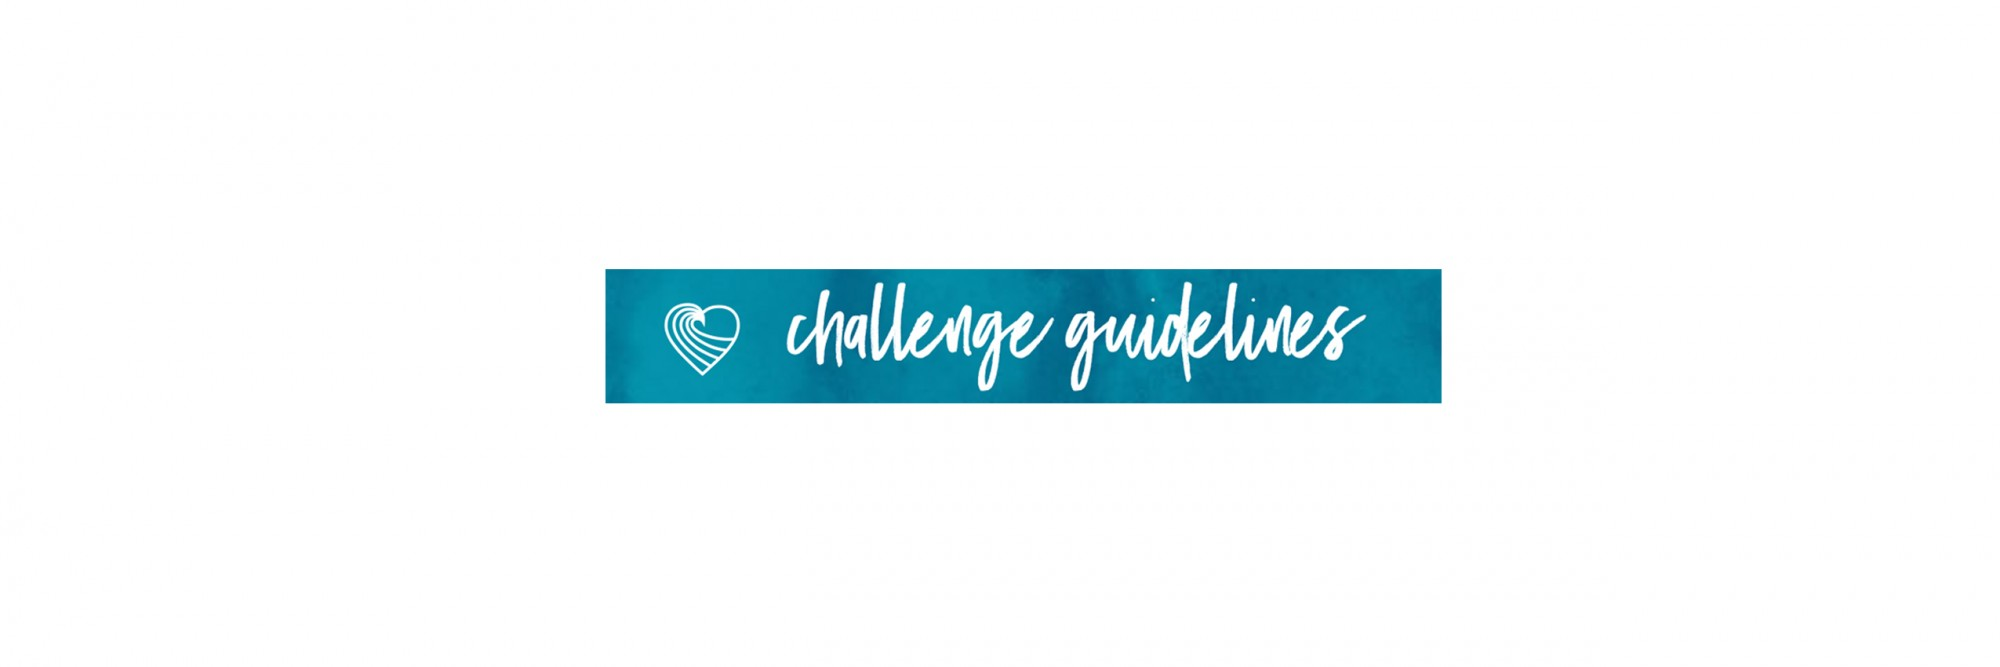 Challenge Guidelines lg